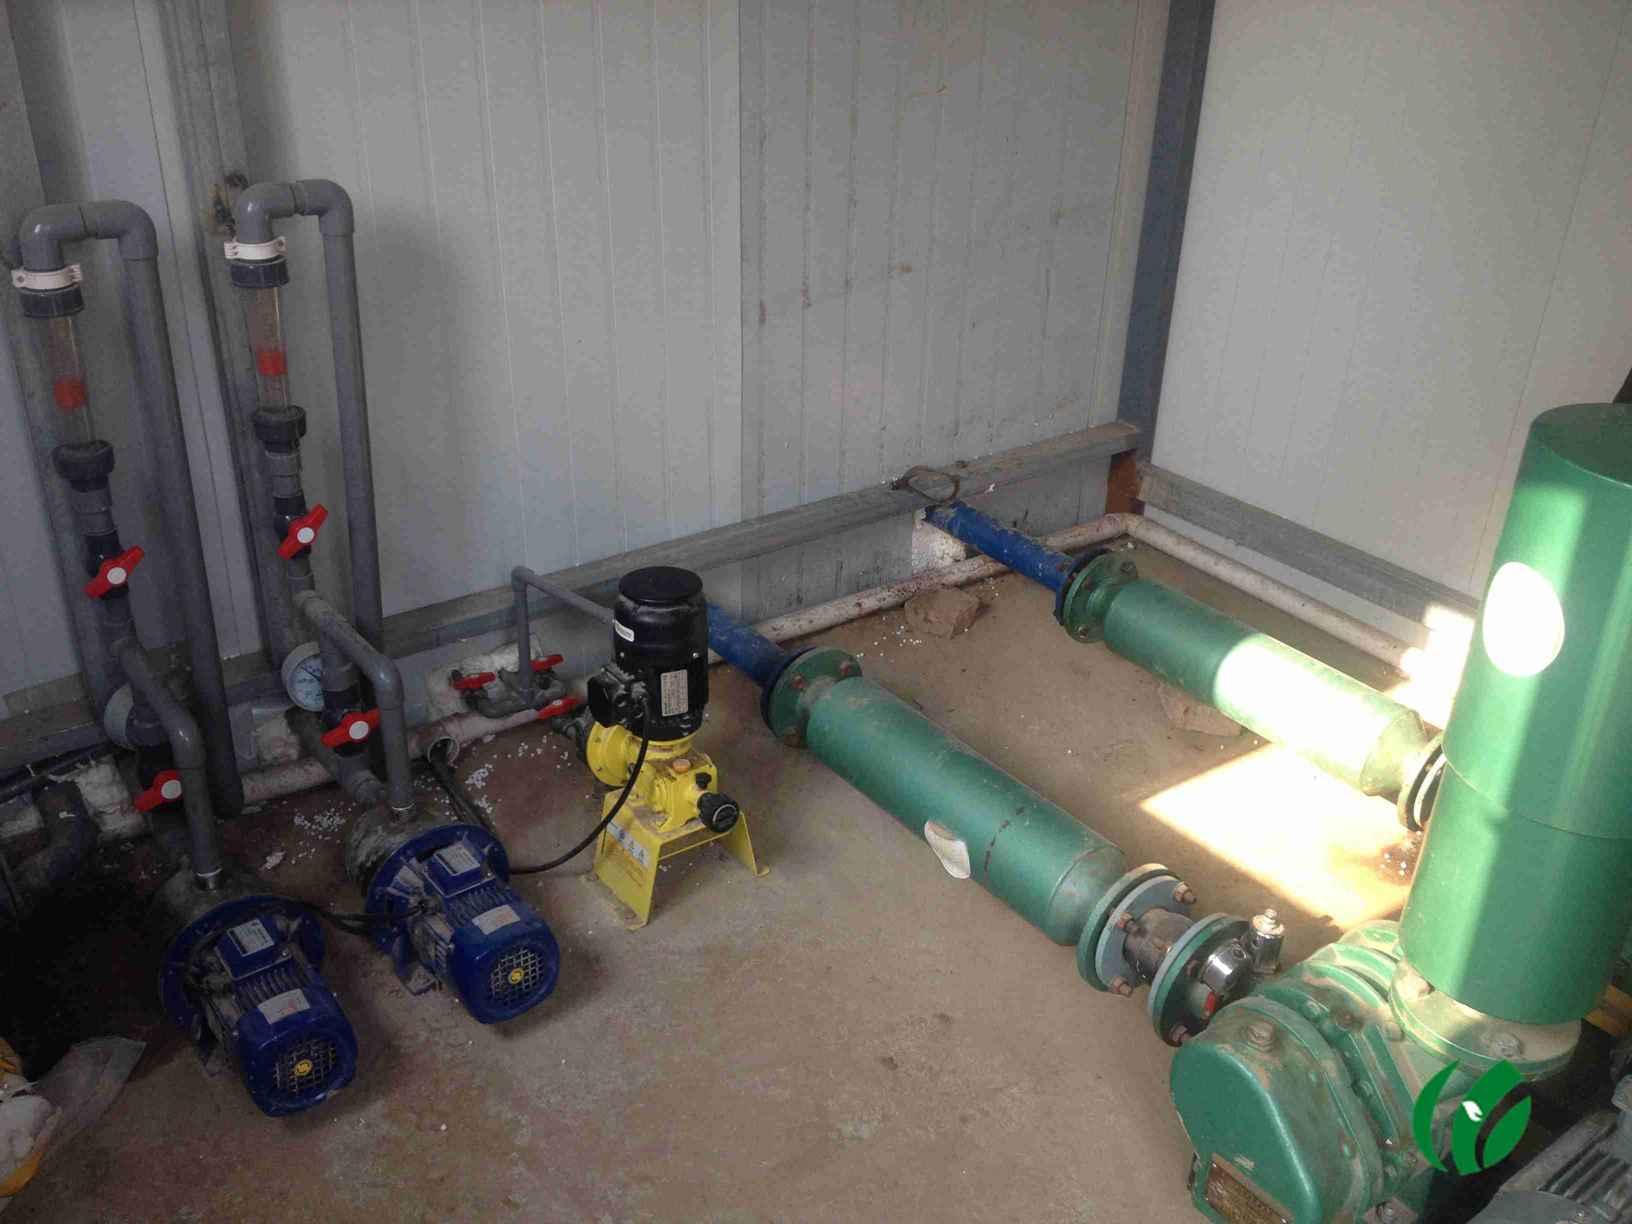 HY-PD25一体化印染污水处理设备:(张女士:18538585830) 一体化印染污水处理设备参数: 1、臭氧用量: 3 g/h 2、曝气机功率: 1.5 K.w 3、空气量: 1.2 3 m3/min 4、贮气罐容积: 1.5 m3 5、流量计规格: 2.0 m3/h 6、水泵功率: 1.1 K.w 7、进水管: 40 mm 8、出水管: 100 mm 9、外形尺寸:2.